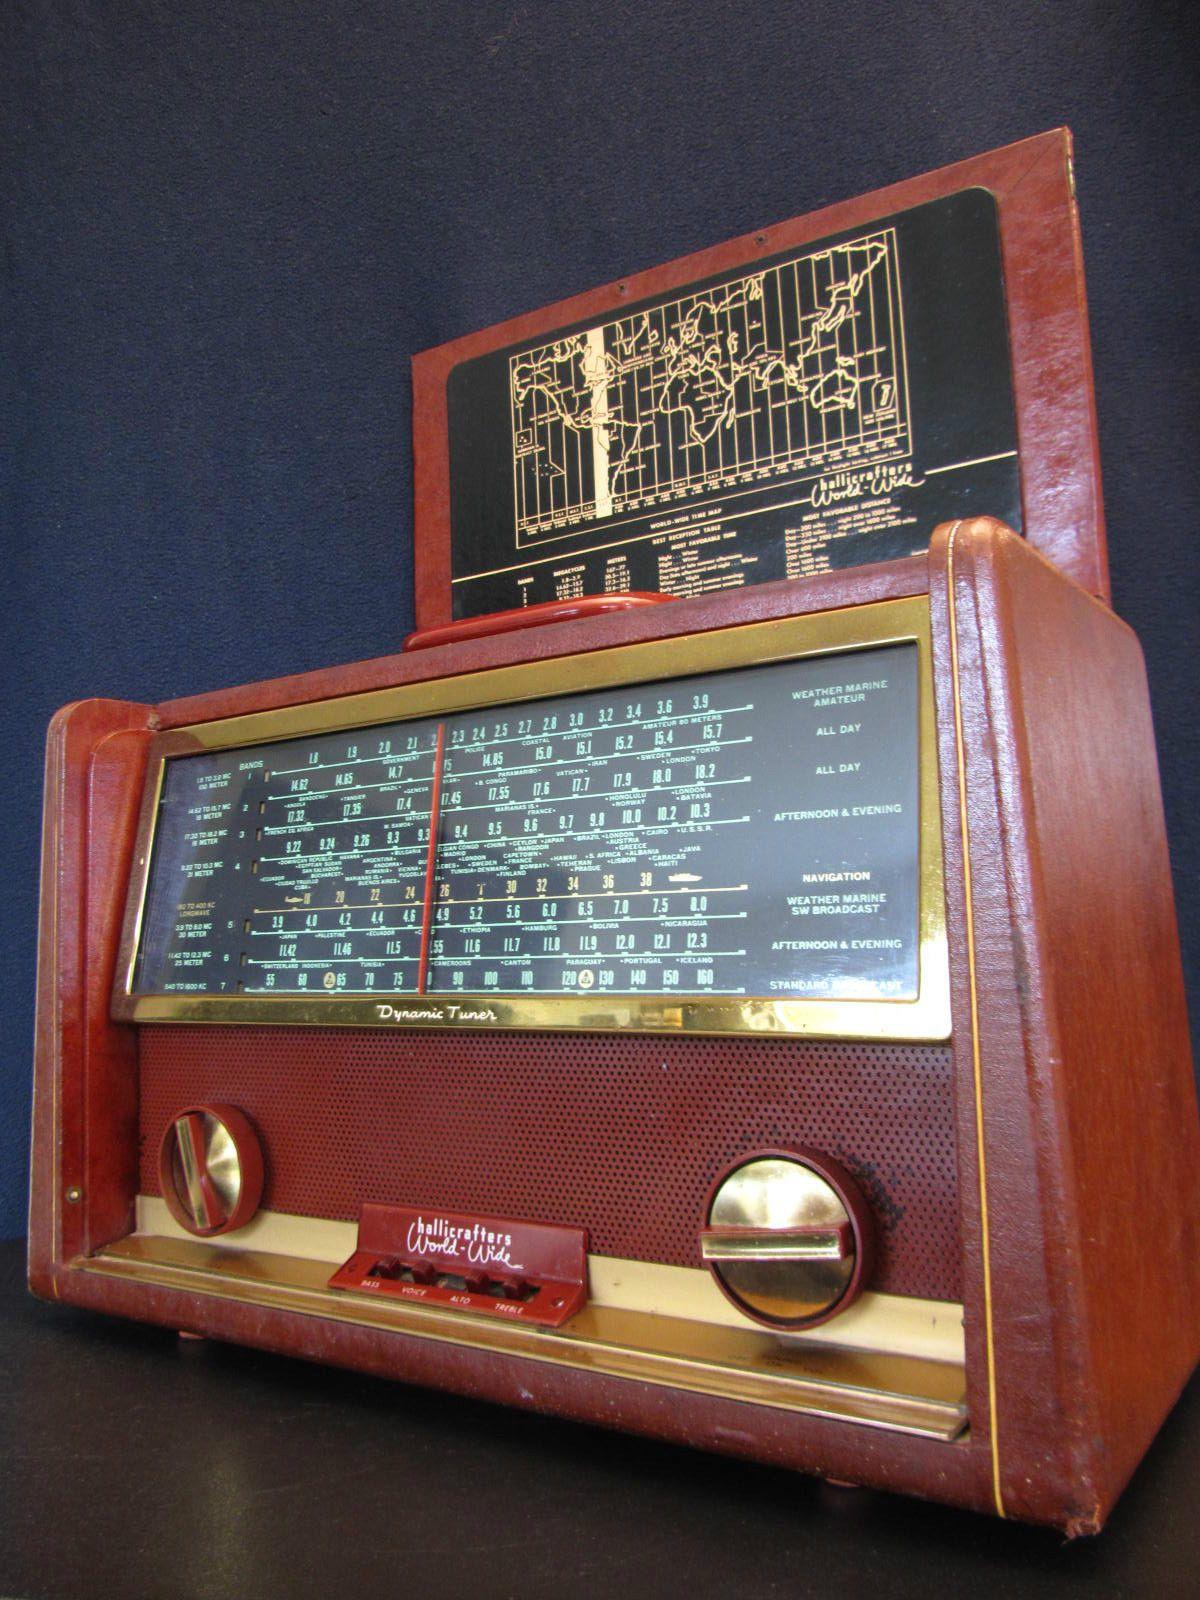 Vintage 1950s Hallicrafters Old Shortwave Analog Multiband Mid Century Radio Vintage Radio Antique Radio Retro Radios